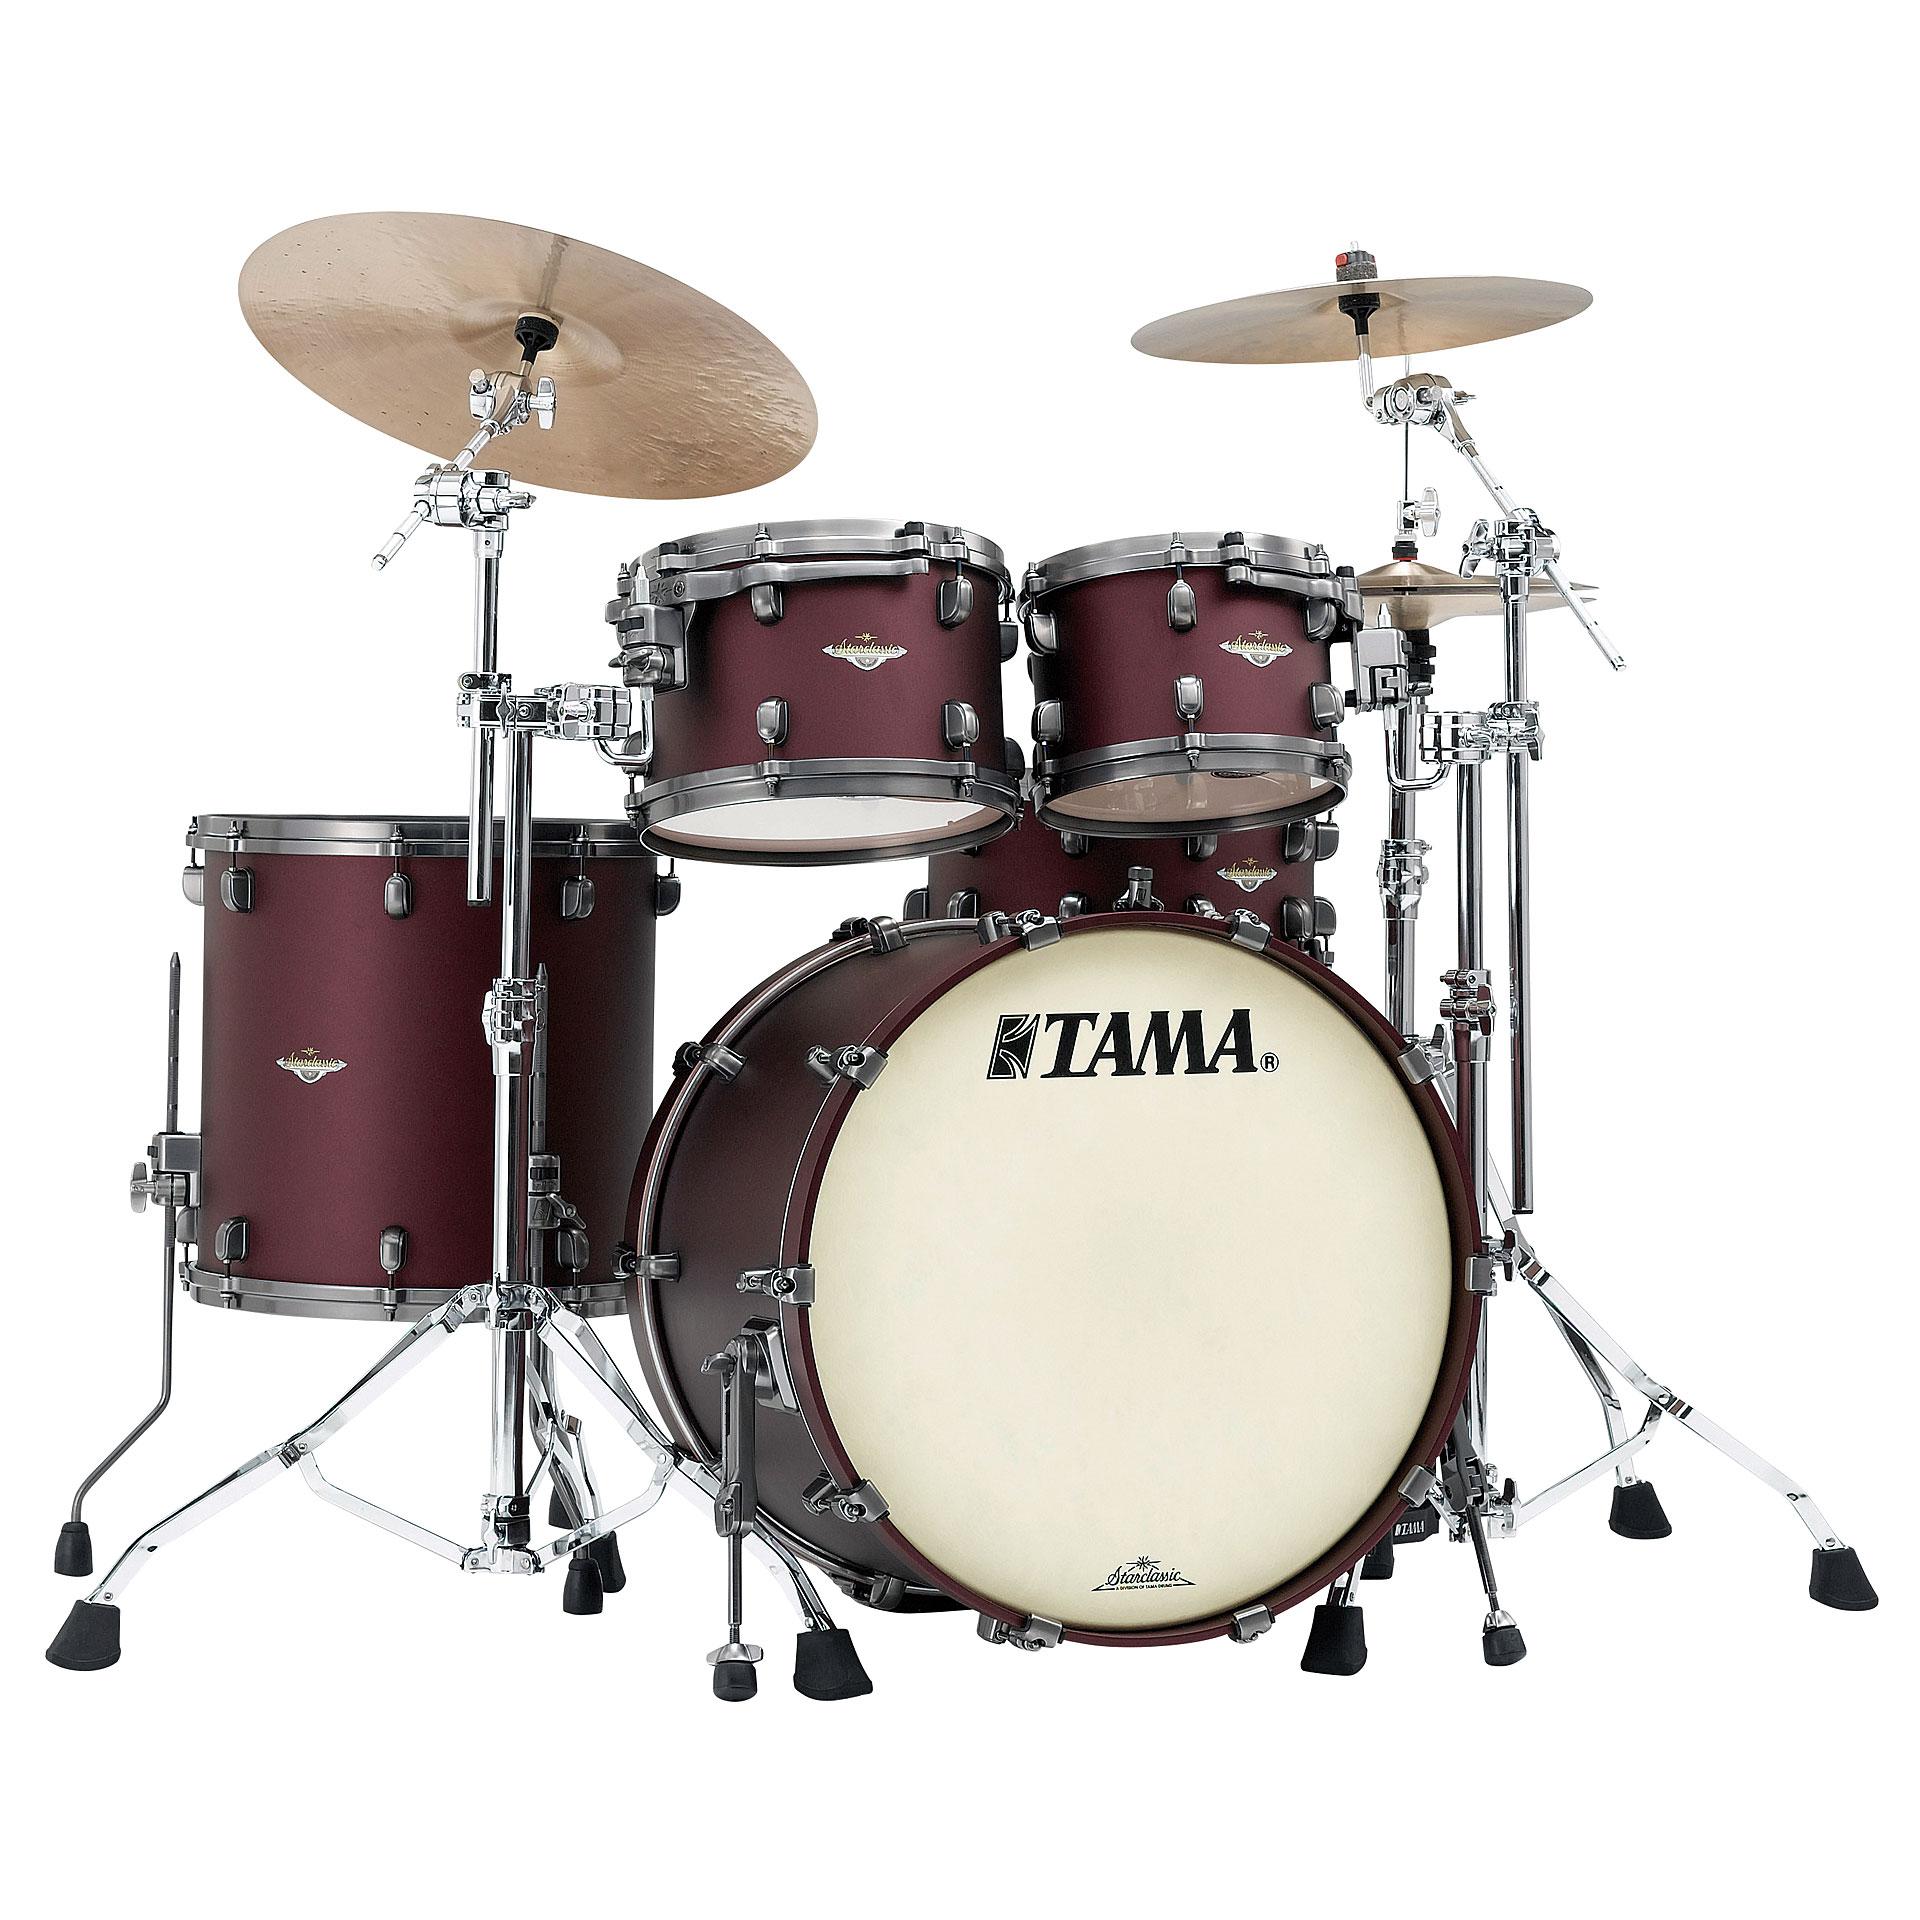 Tama starclassic maple 22 flat burgundy metallic drum kit for Zenhiser classic house drum sounds